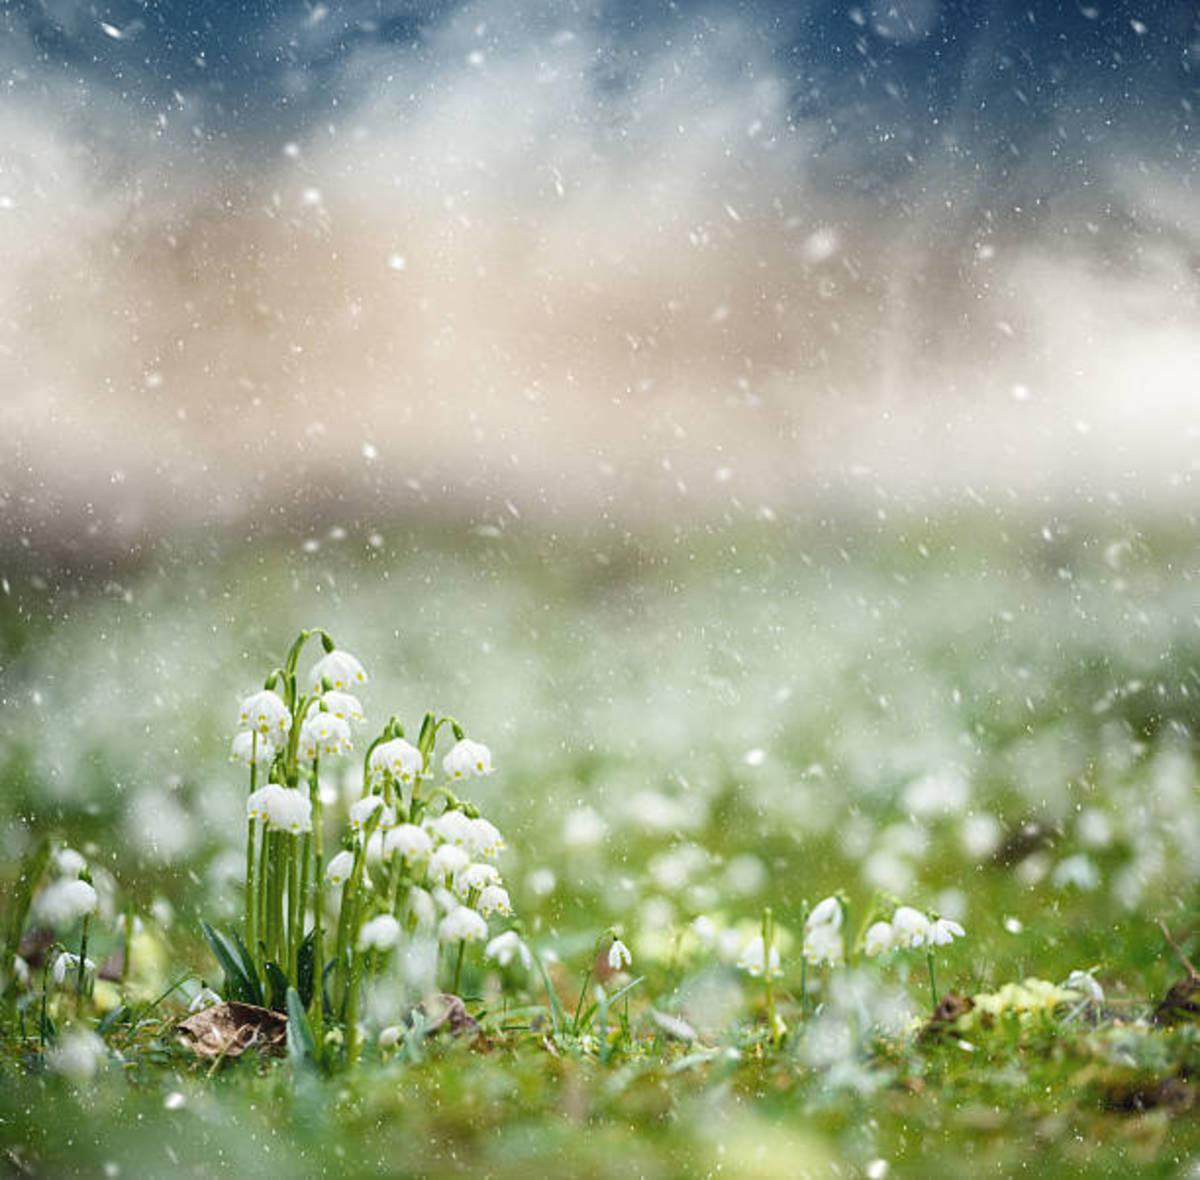 when-the-dashing-rain-falls-down